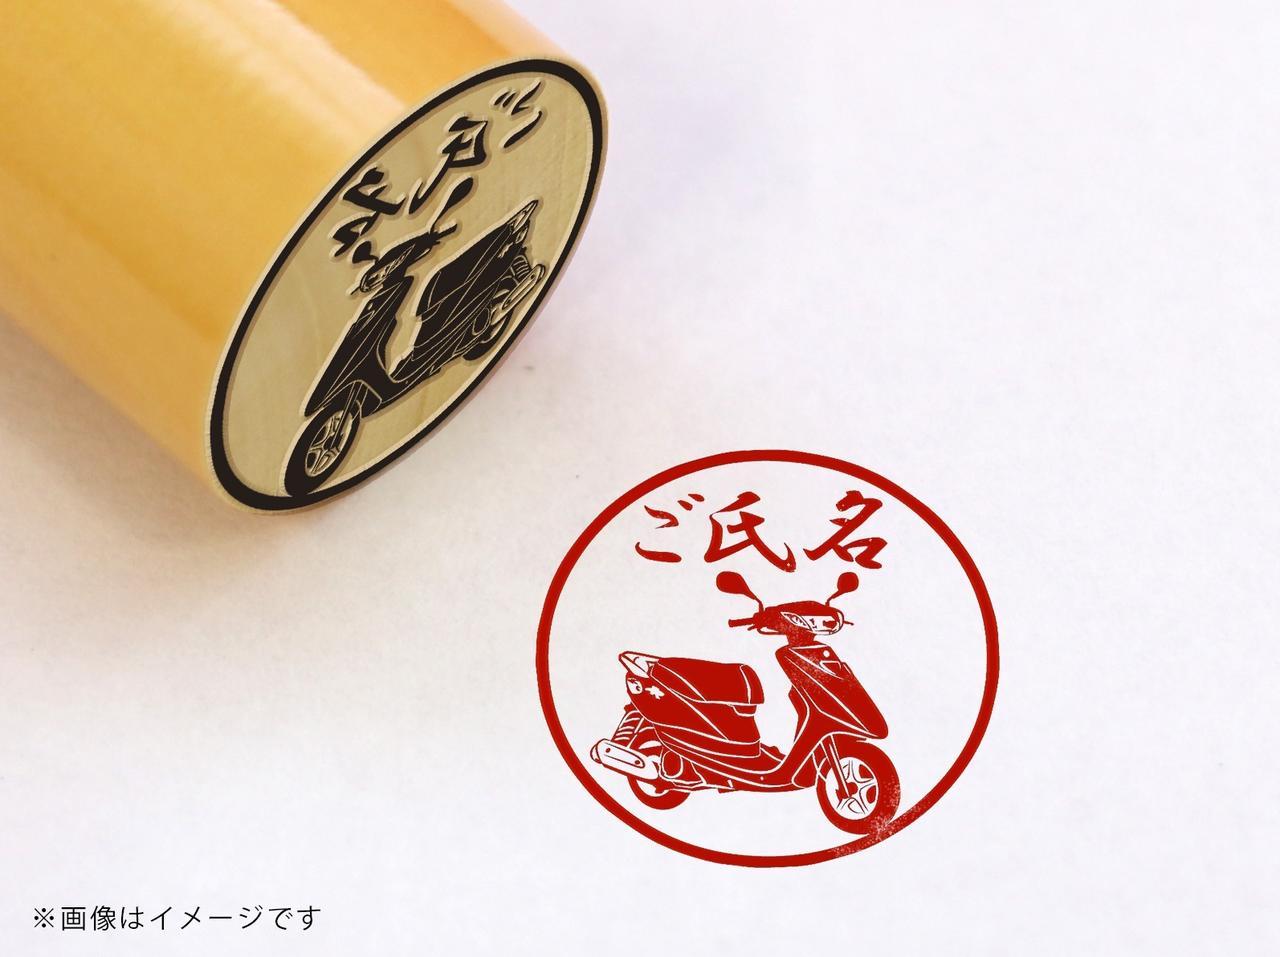 Images : 【YAMAHA】ジョグZR・柘植丸印18mm